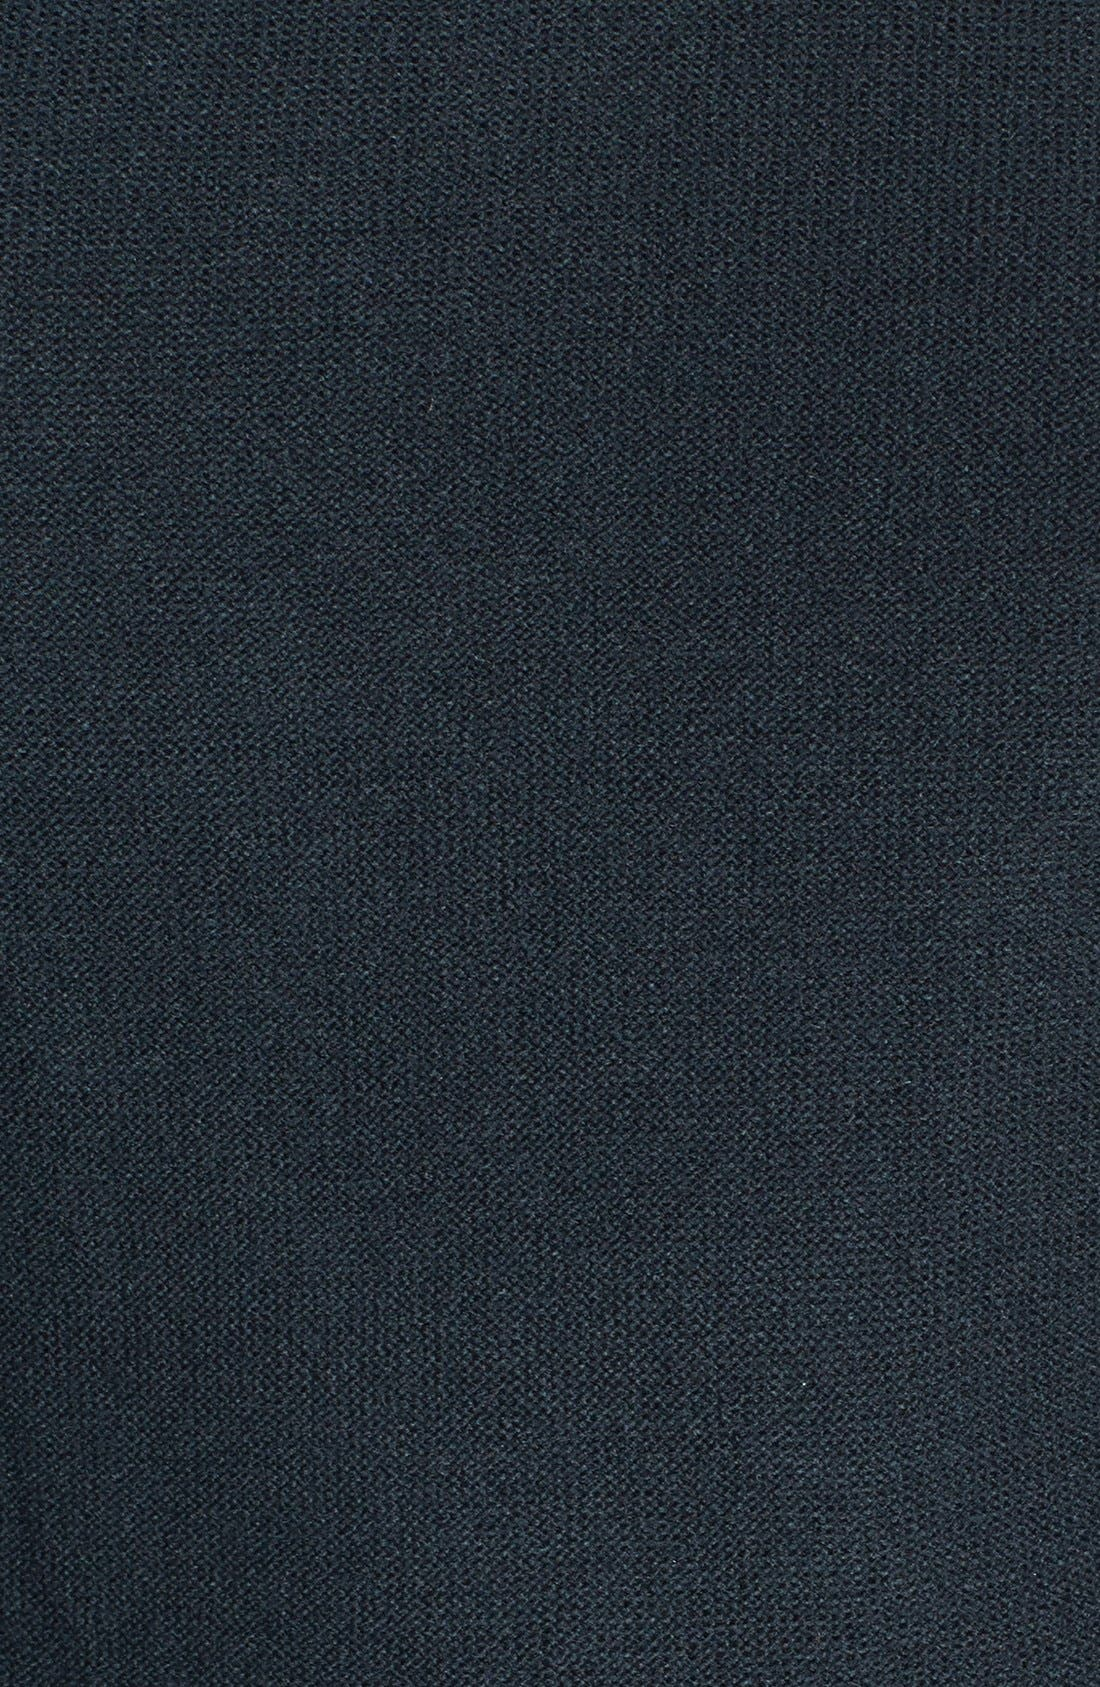 Alternate Image 3  - Tildon Open Back Mixed Knit Sweater